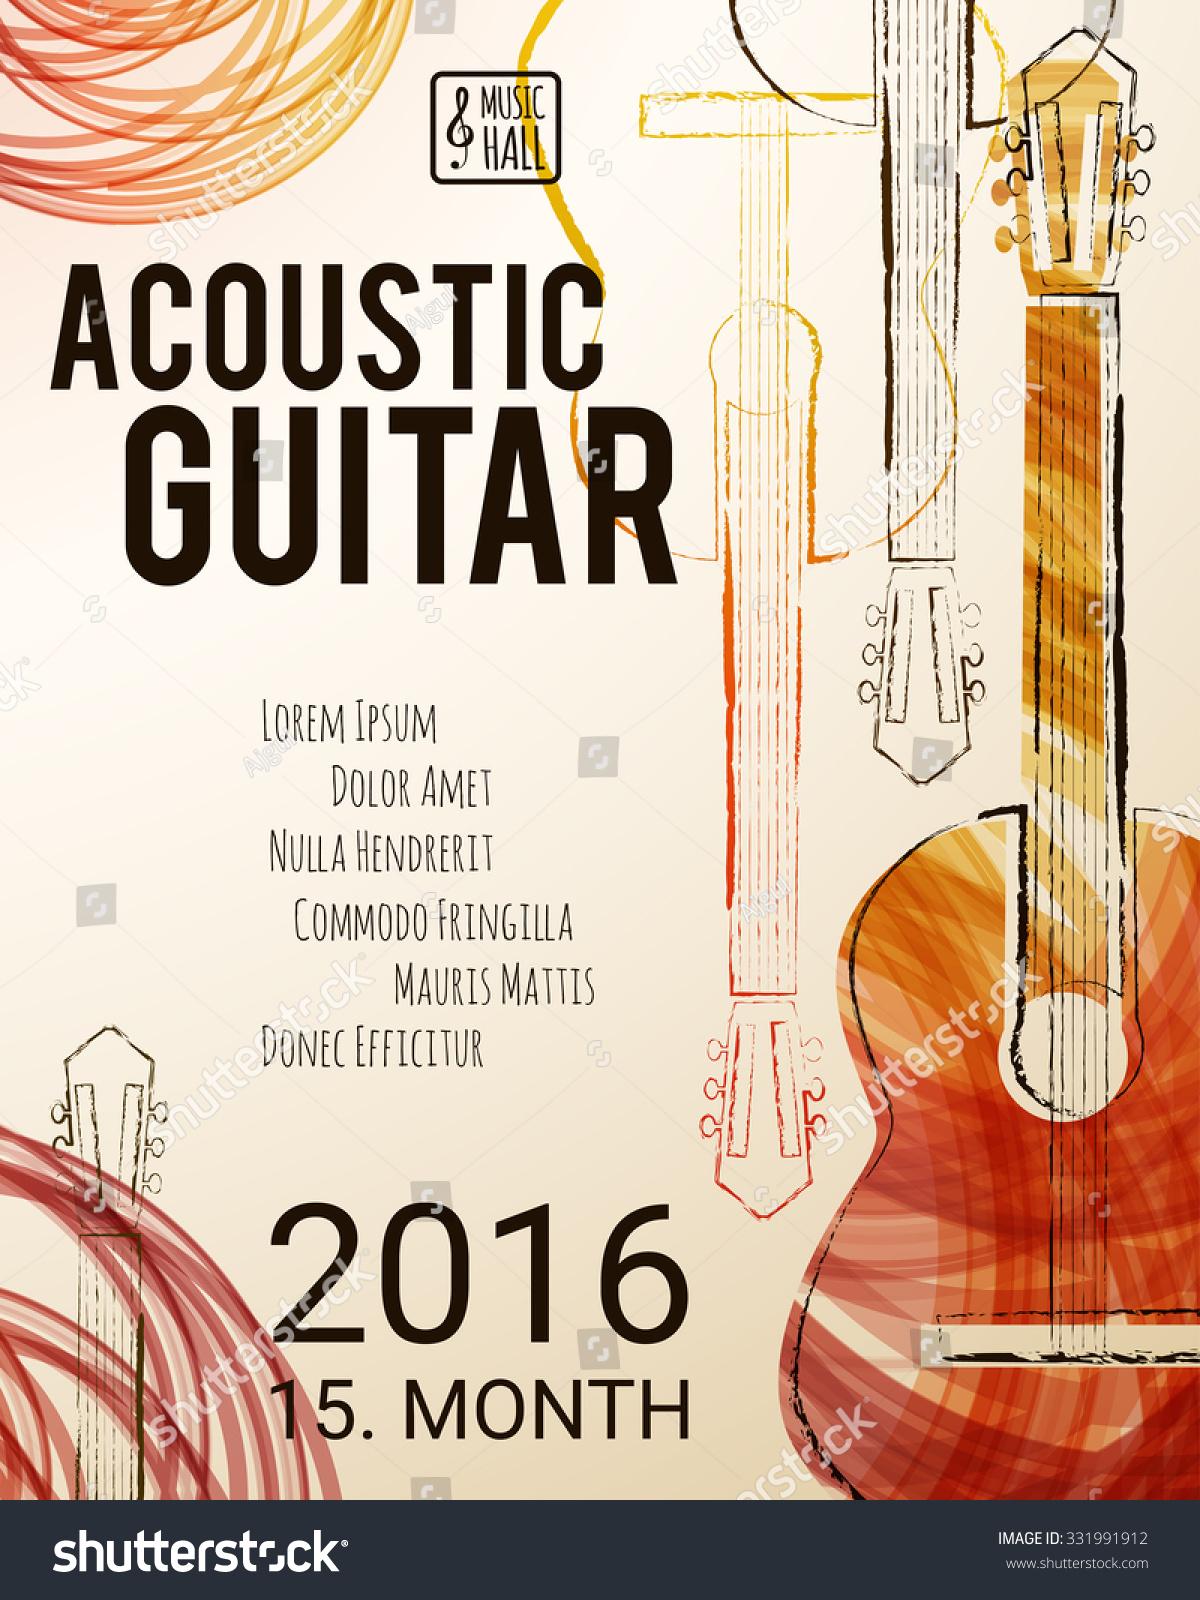 acoustic guitar event design flyer poster stock vector  acoustic guitar event design for flyer poster invitation vector illustration